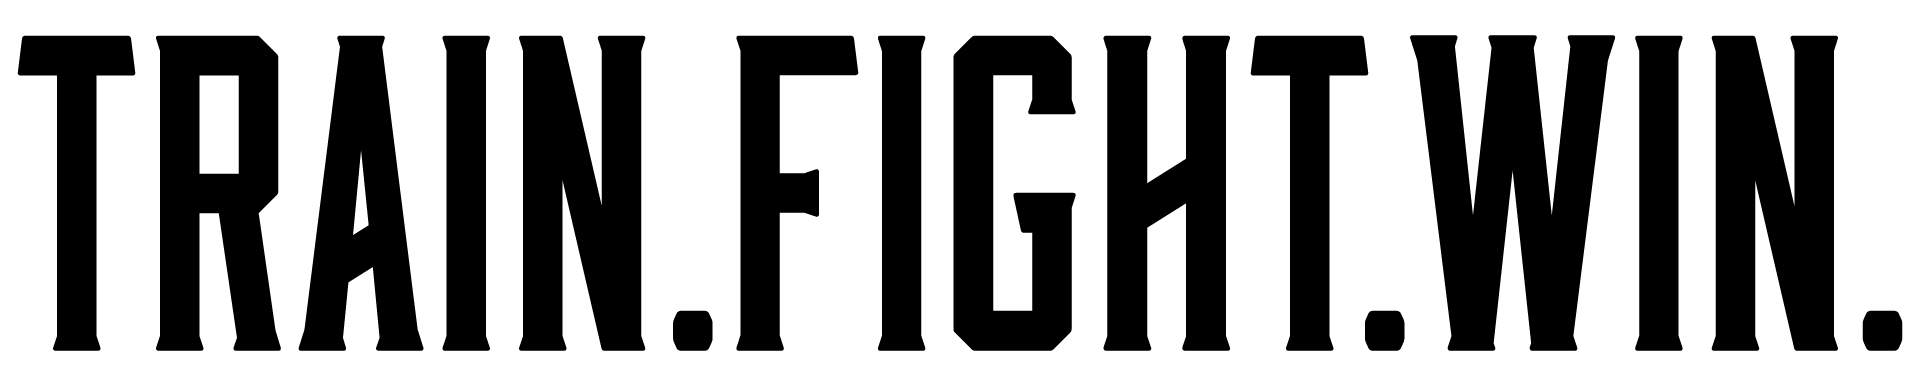 TFW_Logo_SecondaryType_Black.png